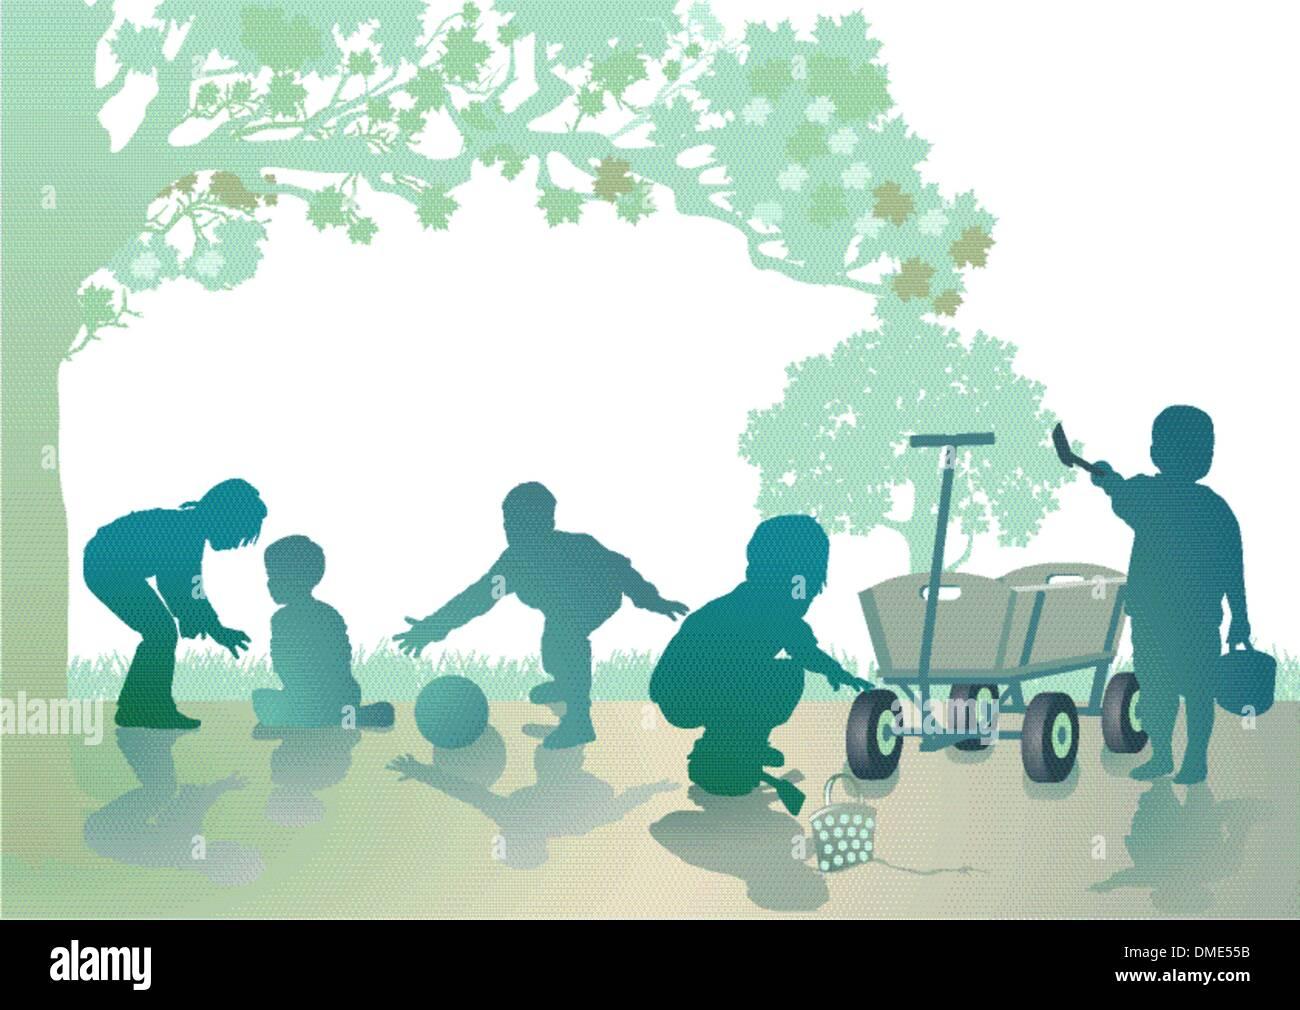 Kids in the sandbox - Stock Image